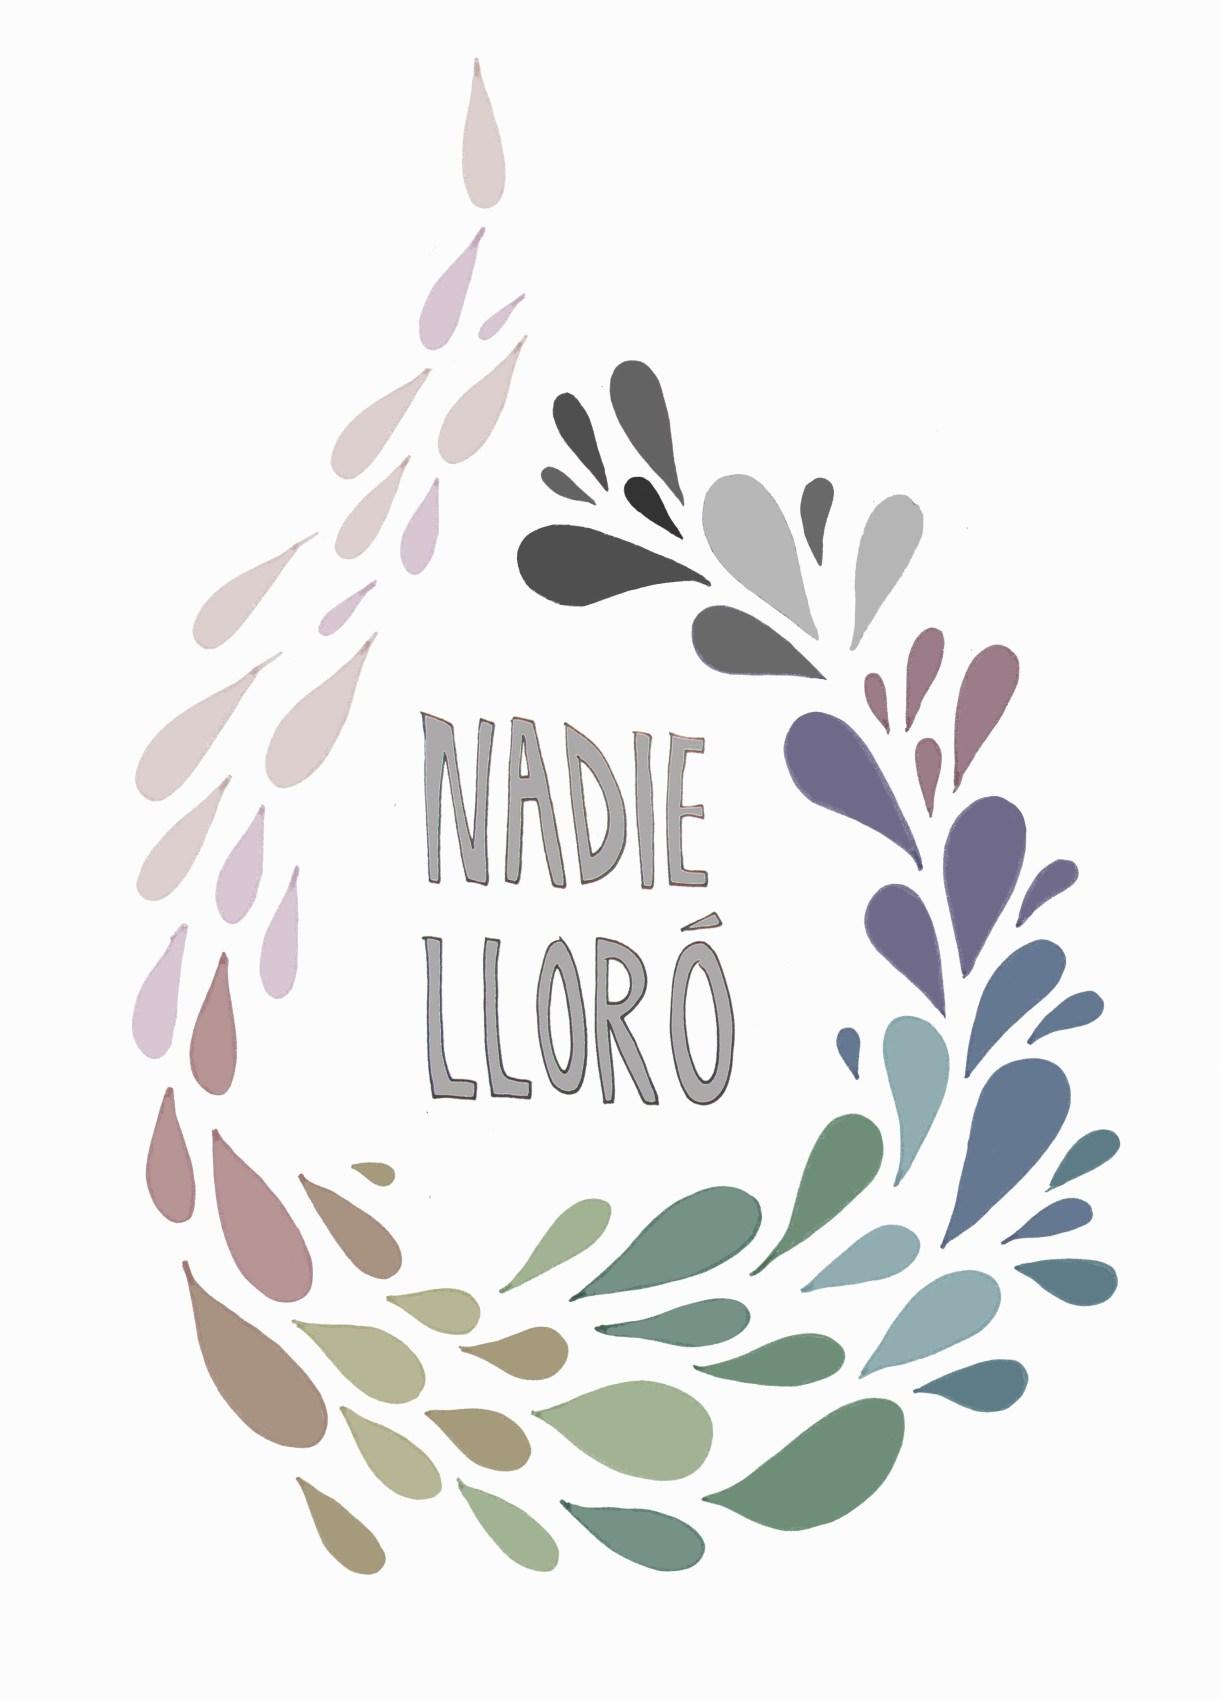 NADIELLORO